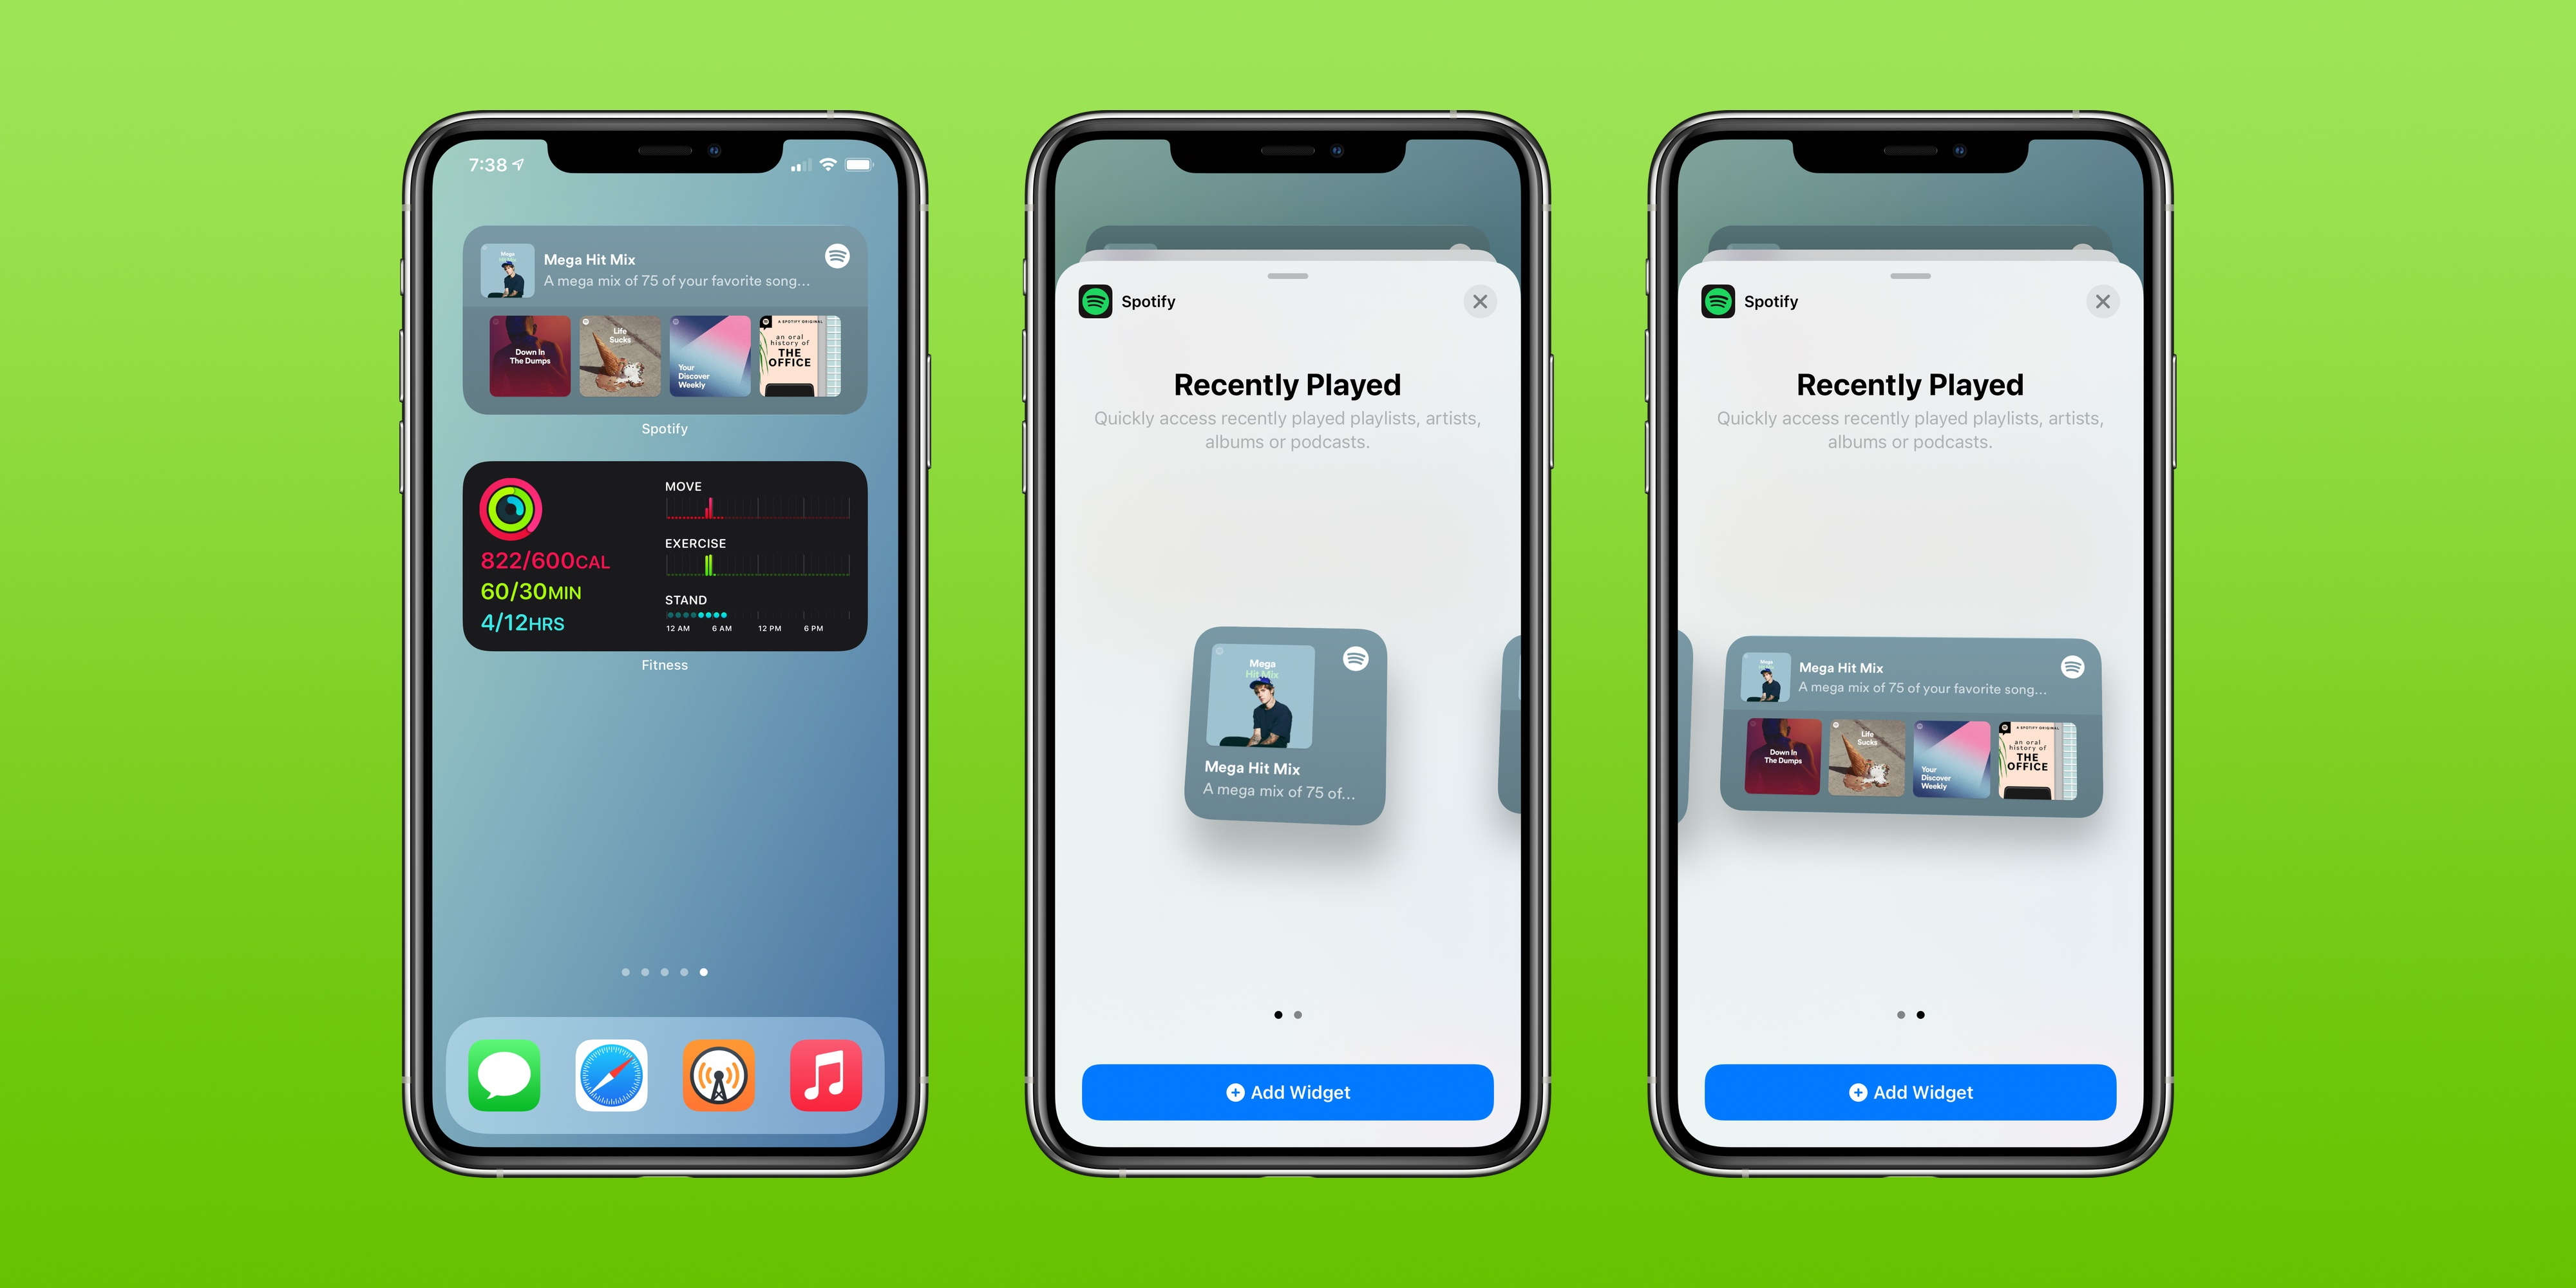 [Mac] Spotify Widget - The Spotify Community